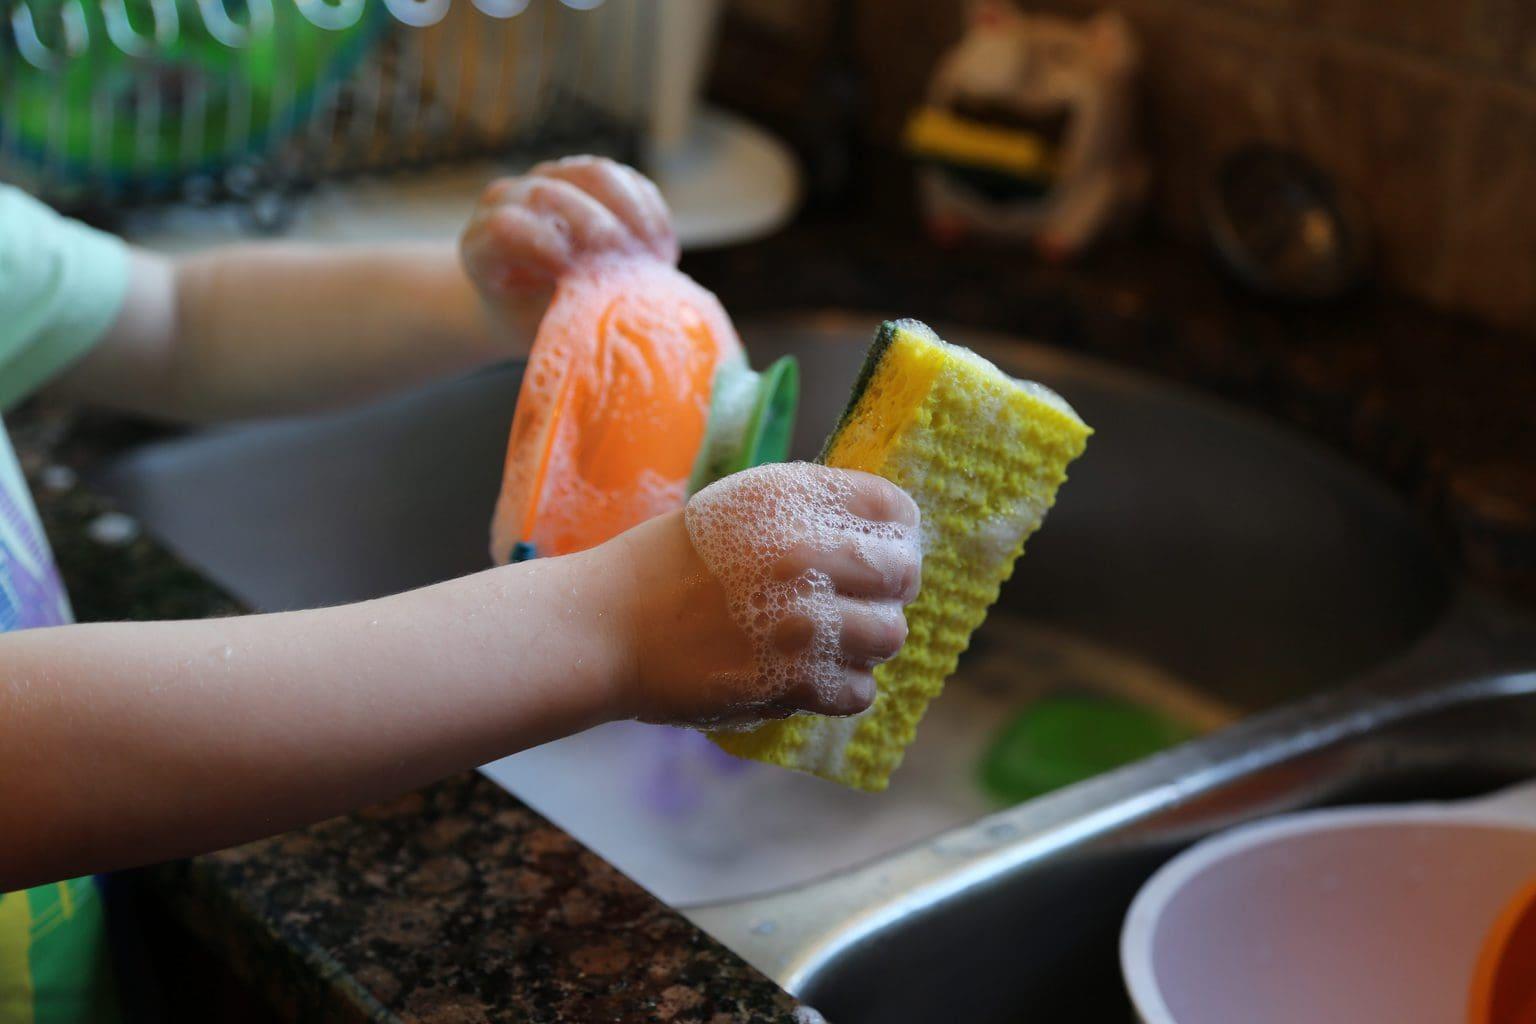 Child holding a sponge